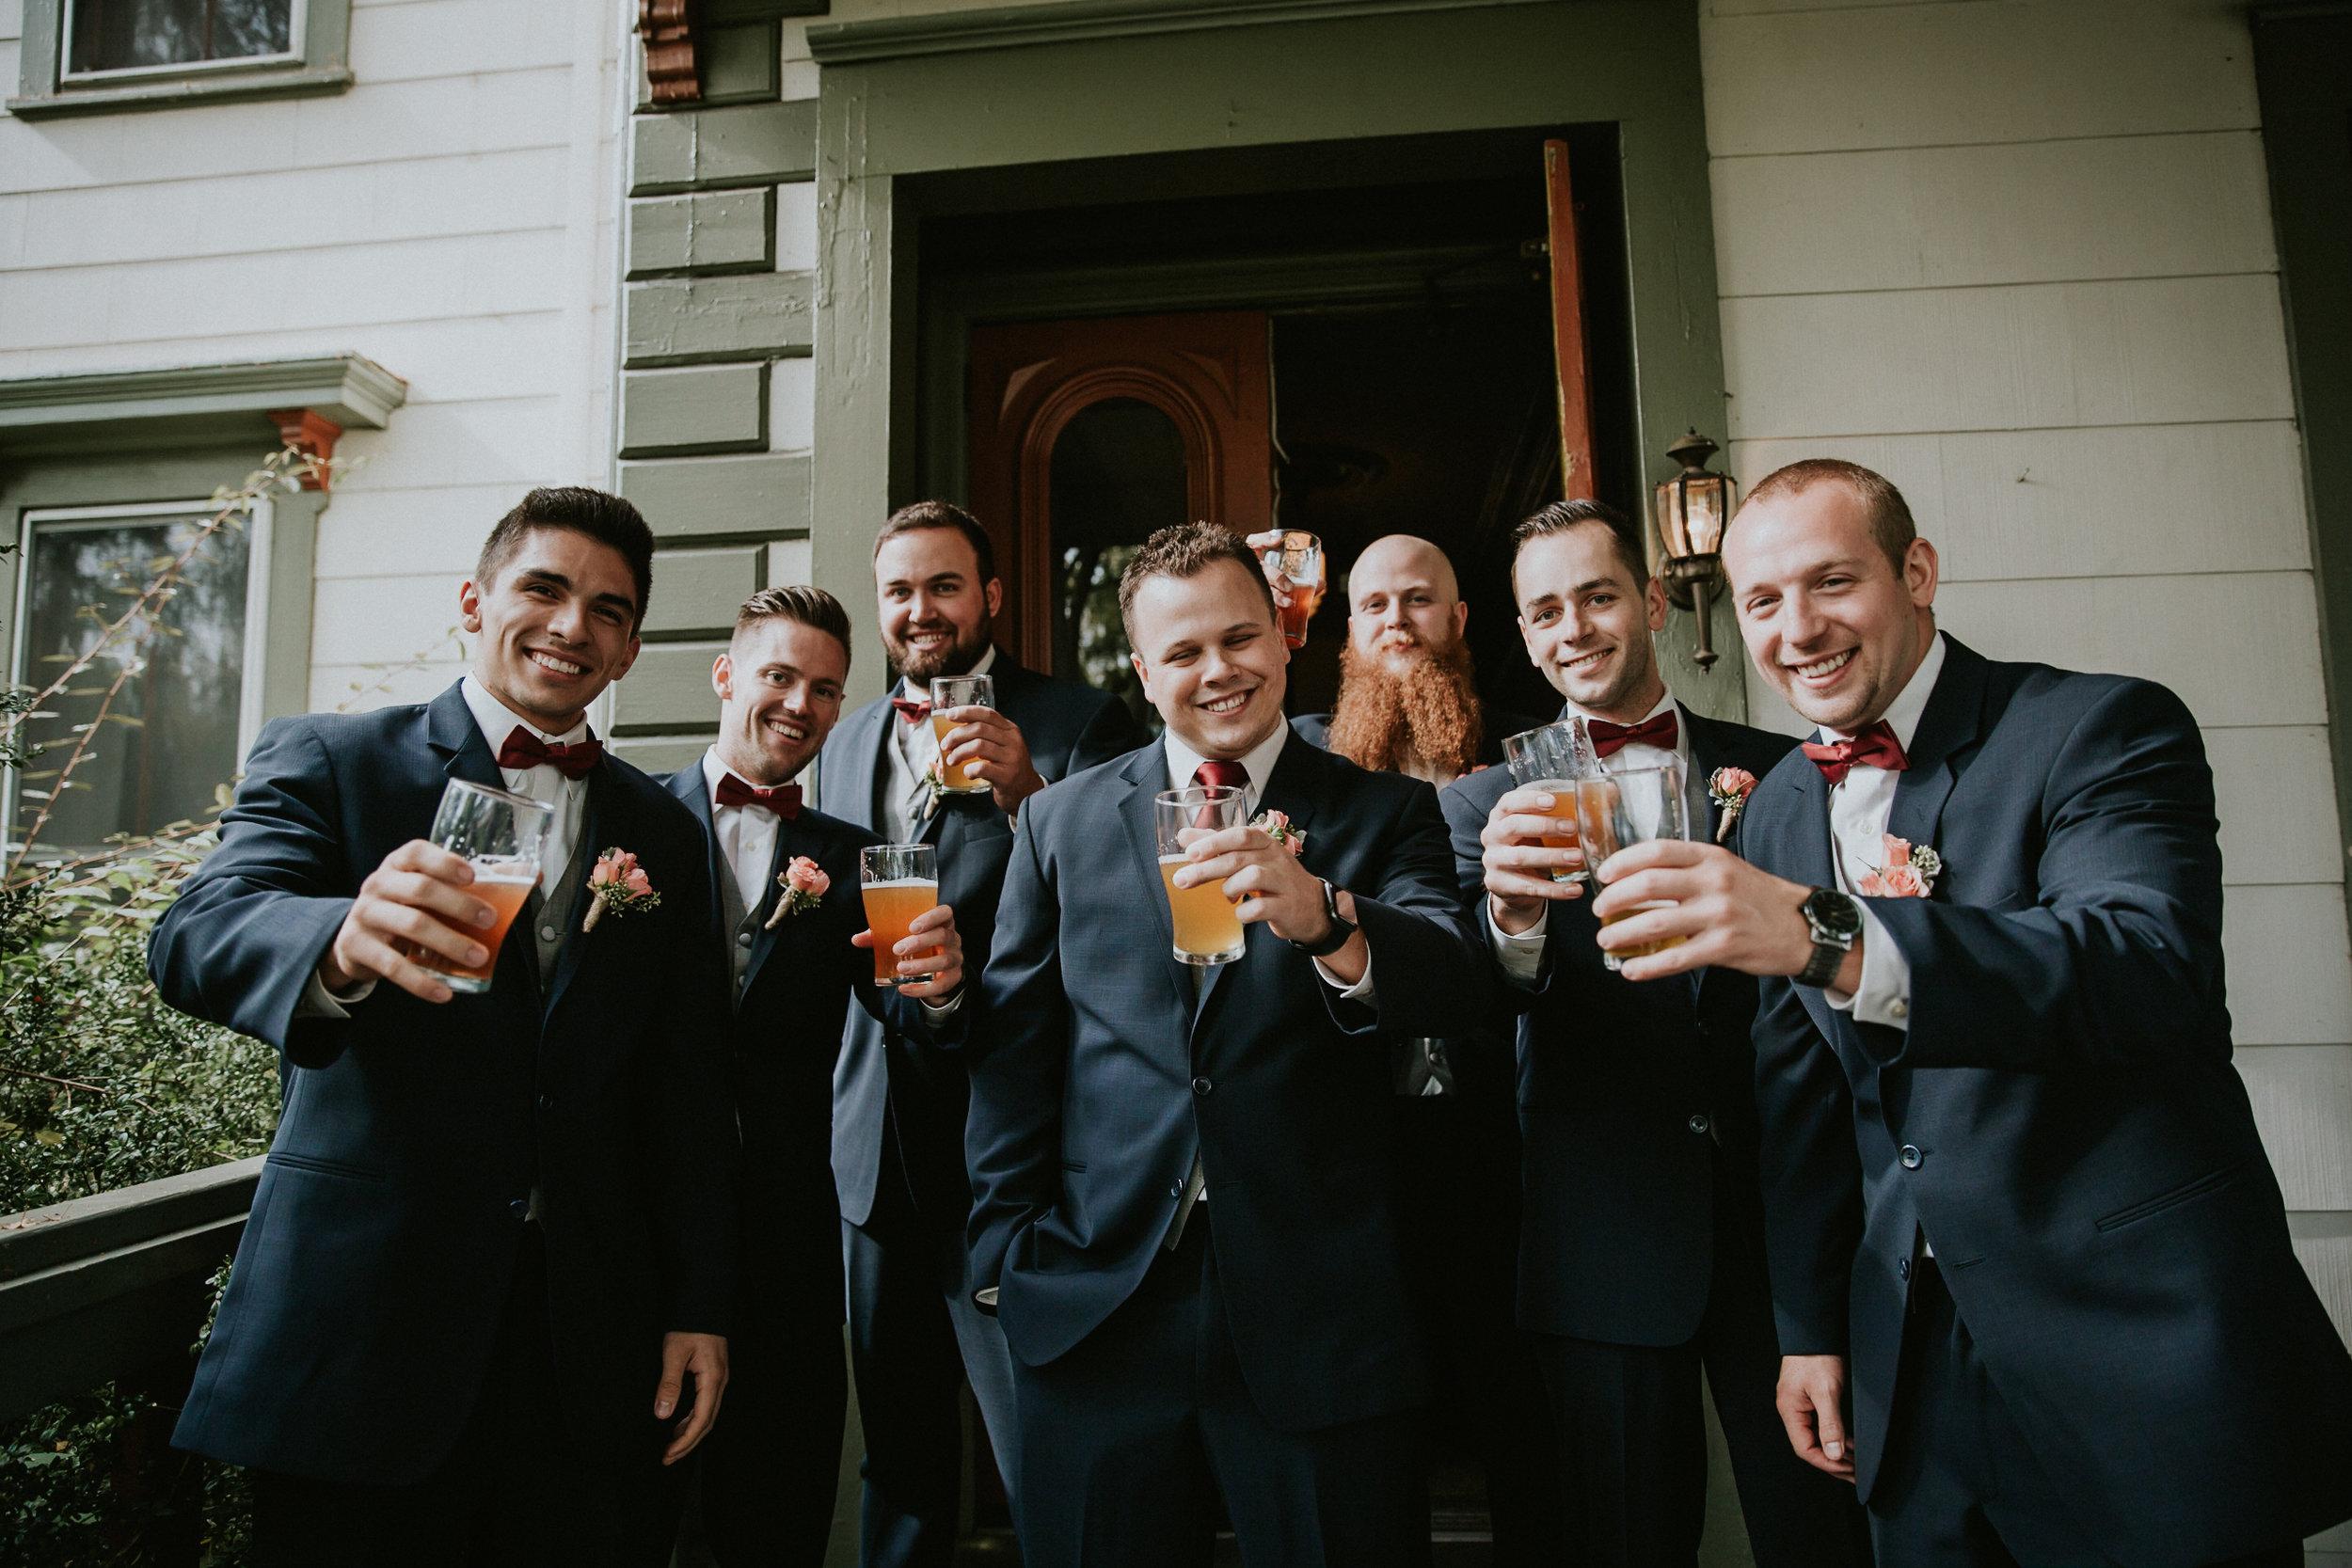 Portland_wedding_photographer_McMenamins_Alfred_Tang-18.jpg